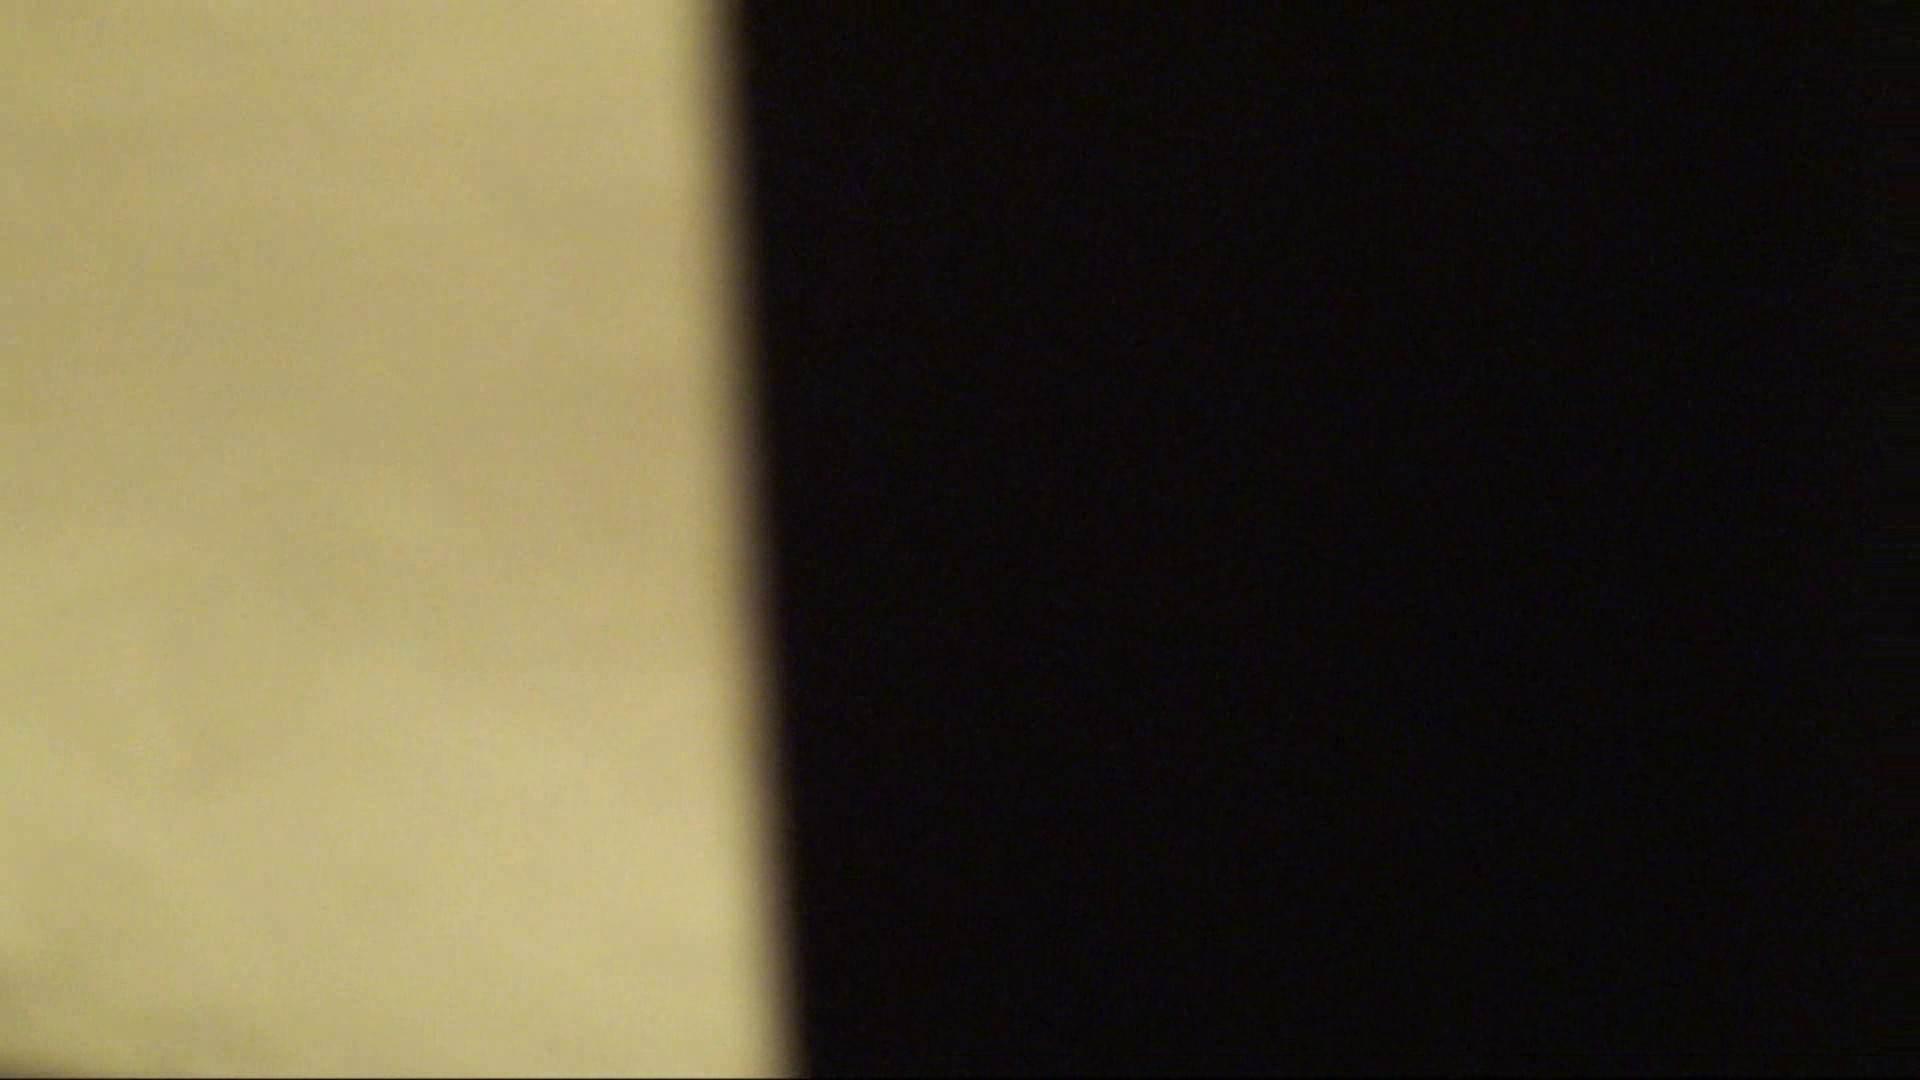 vol.02超可愛すぎる彼女の裸体をハイビジョンで!至近距離での眺め最高! 美人   民家  78pic 19